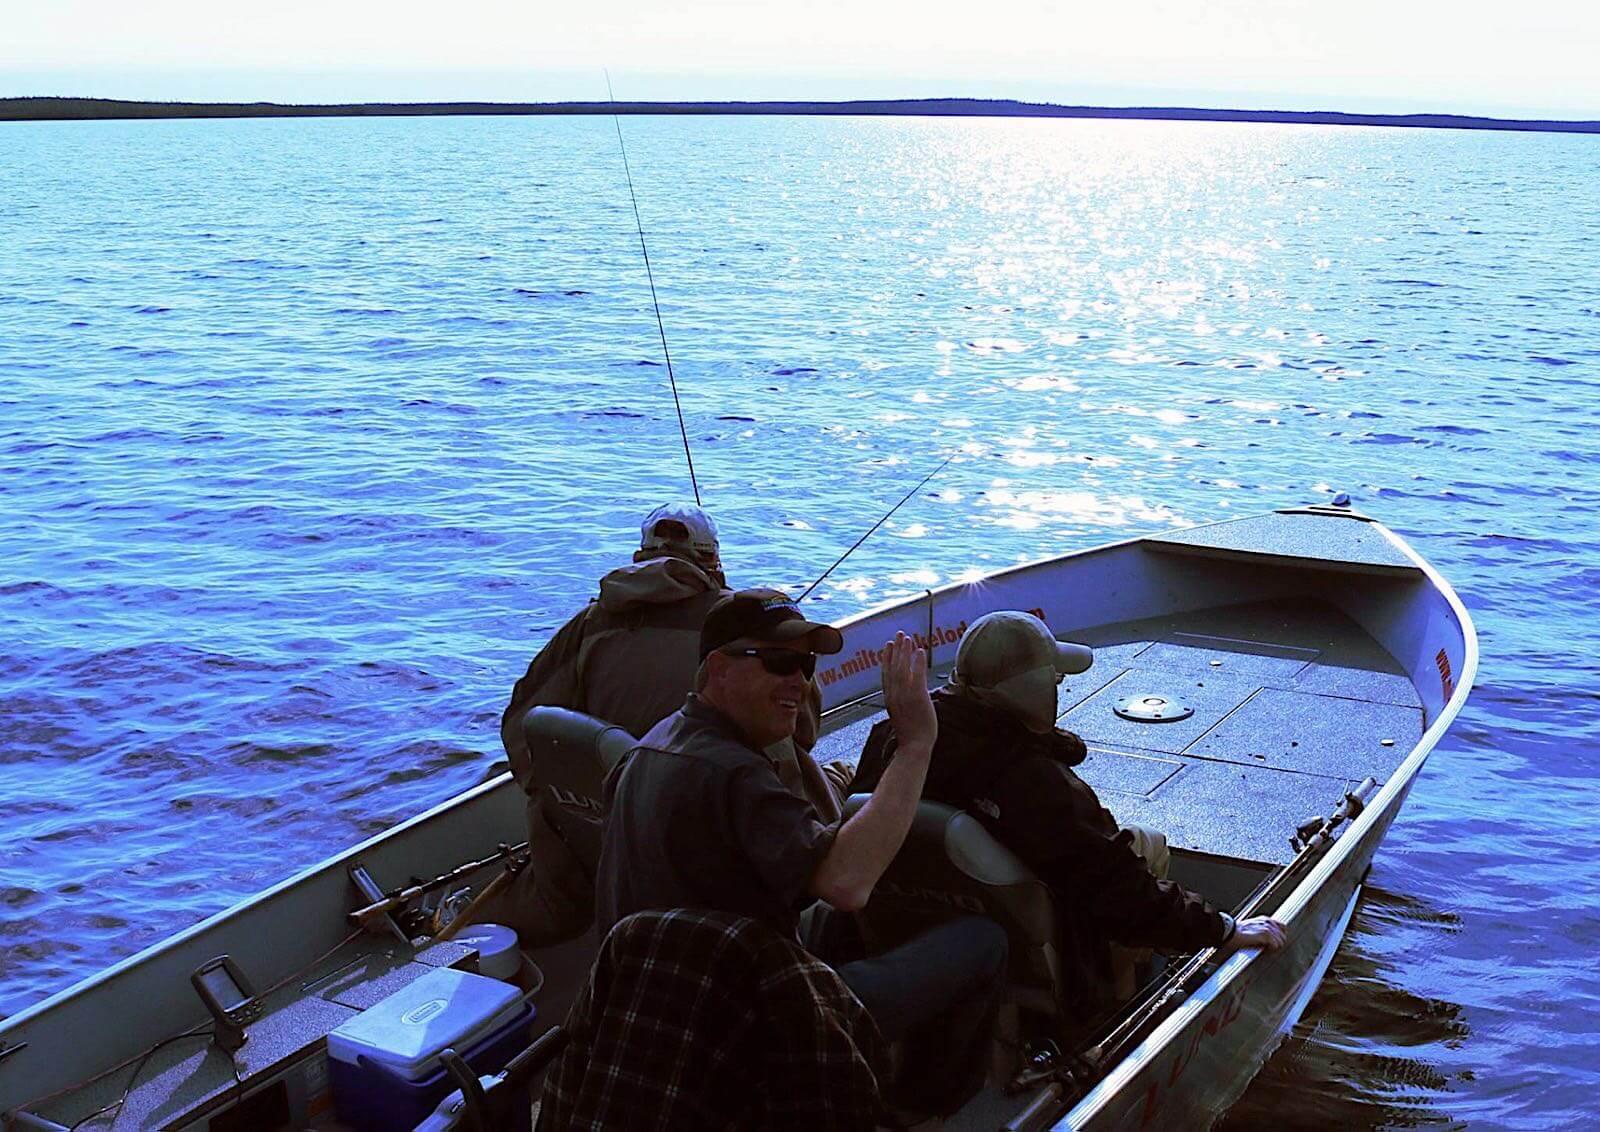 fishing lodge boats and equipment in Saskatchewan